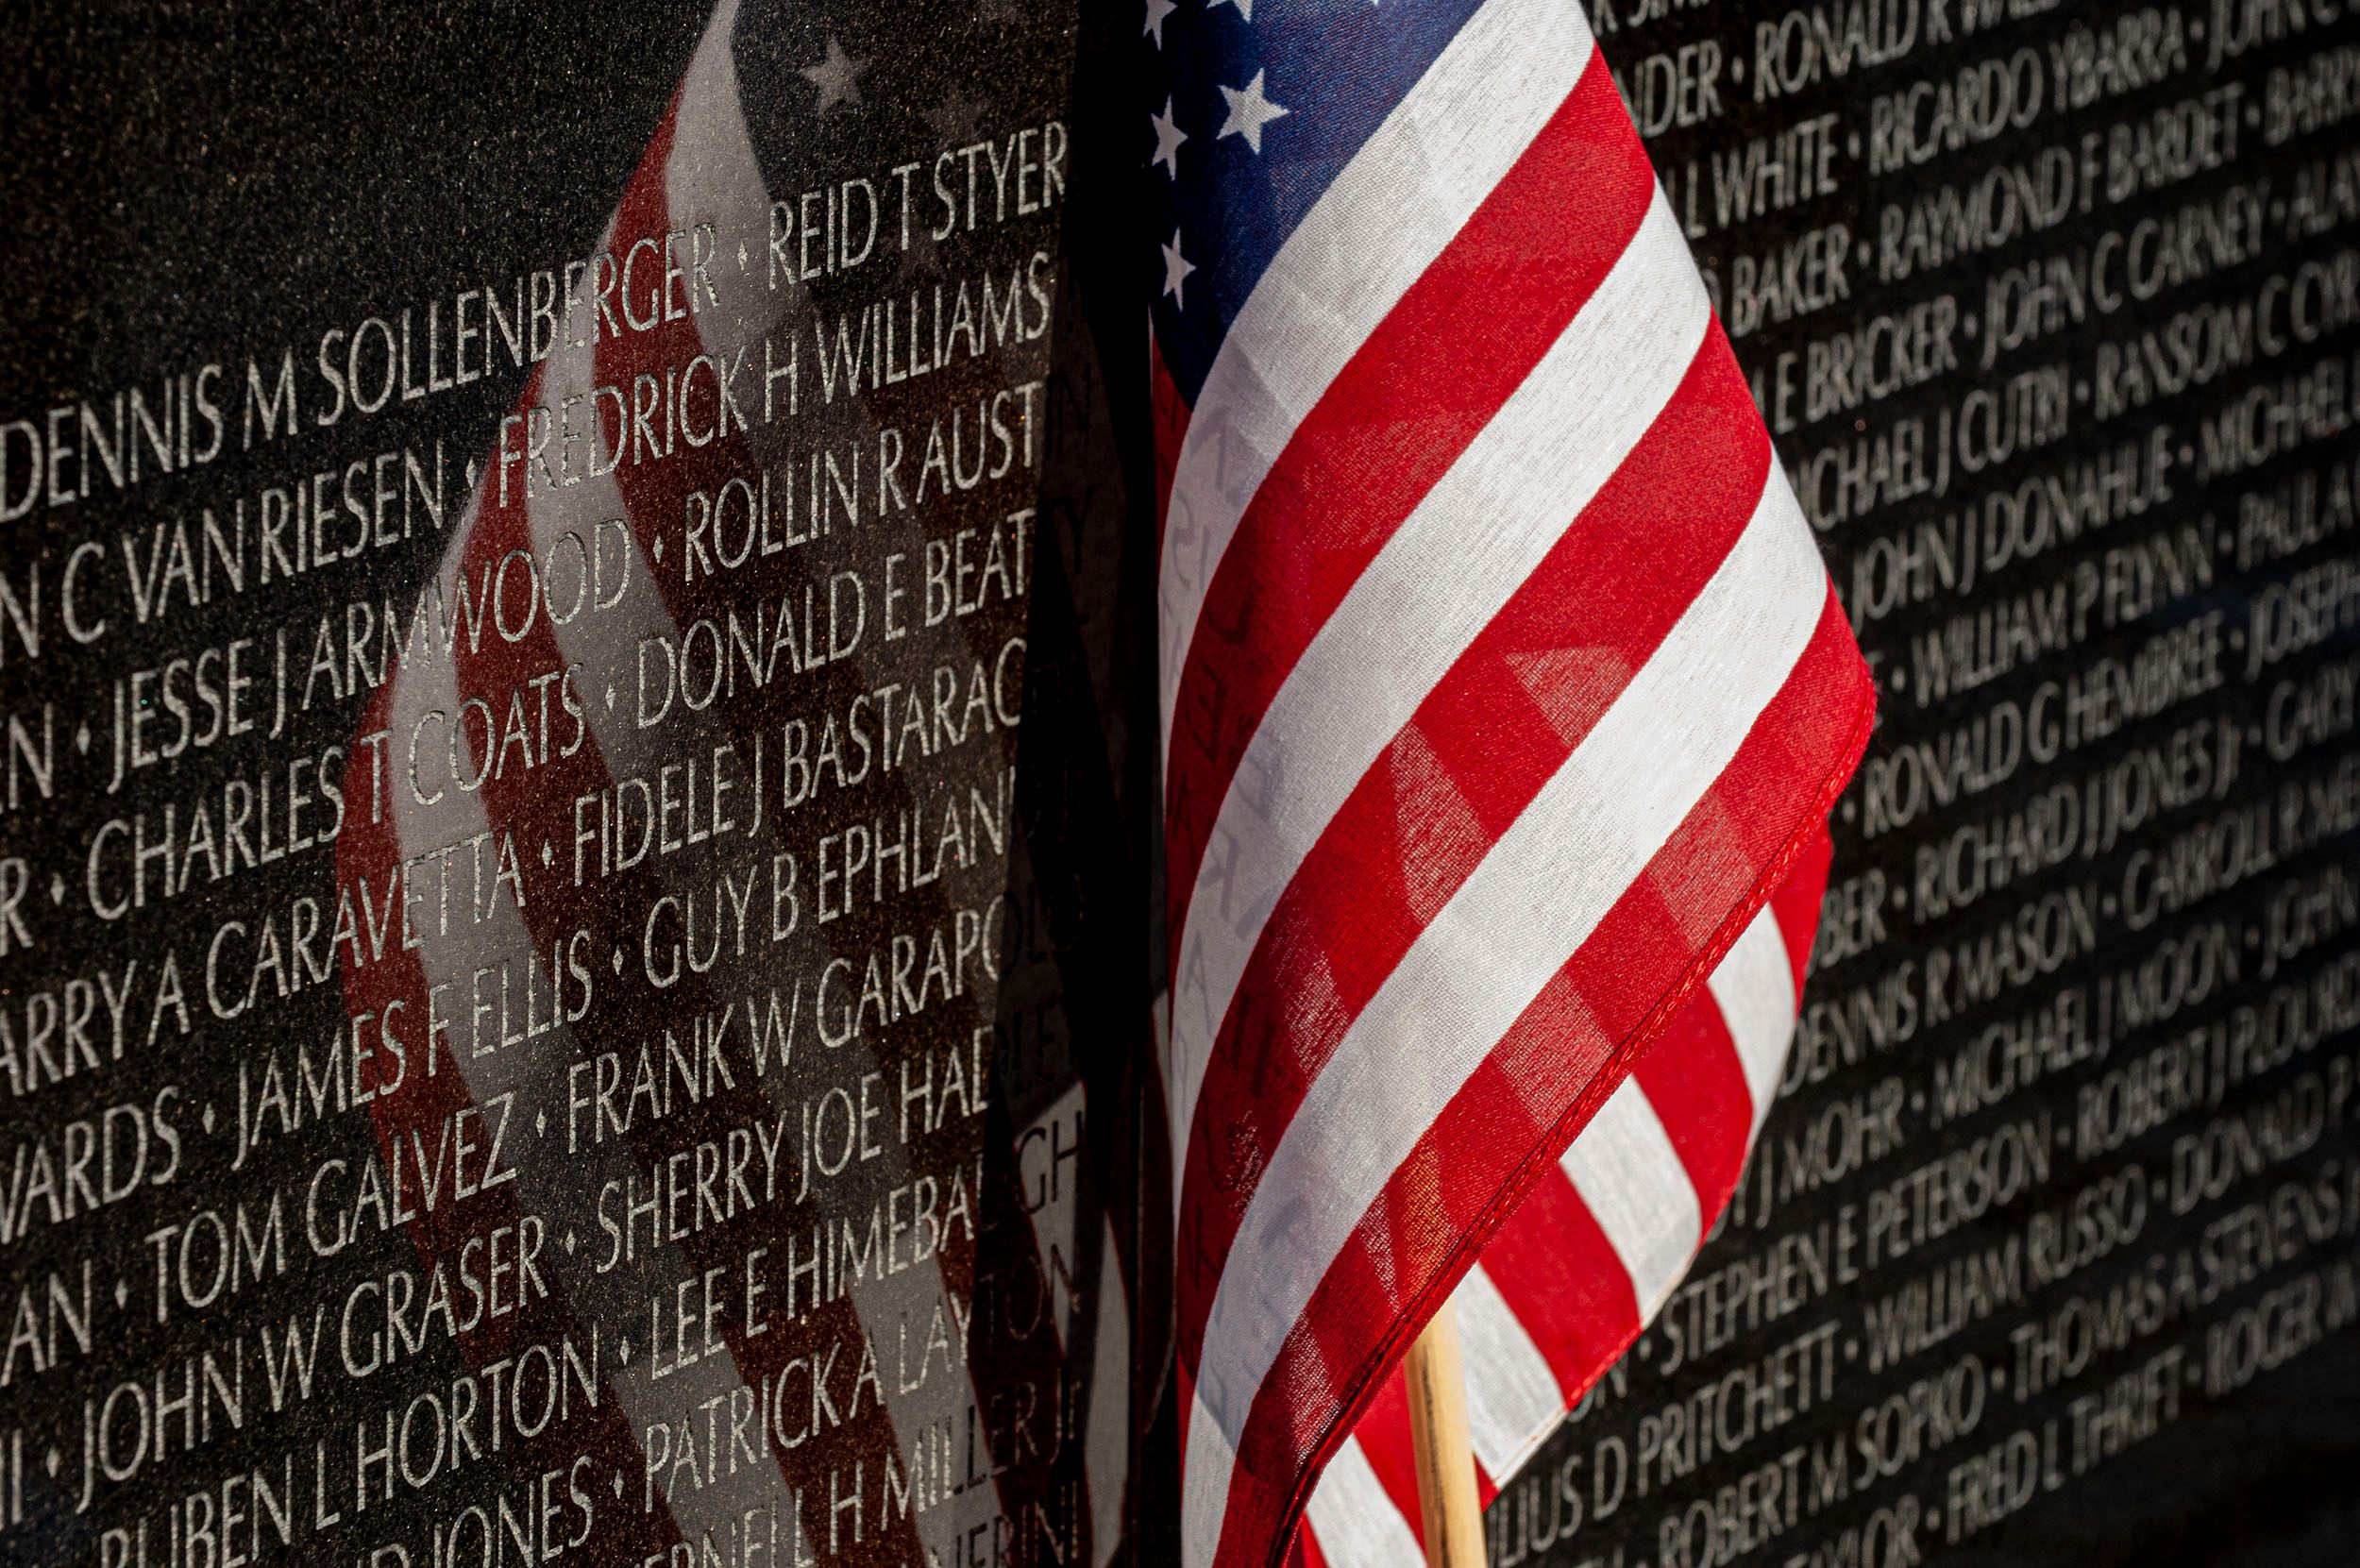 Vietnam Memorial. Veterans Day, Washington, D.C.